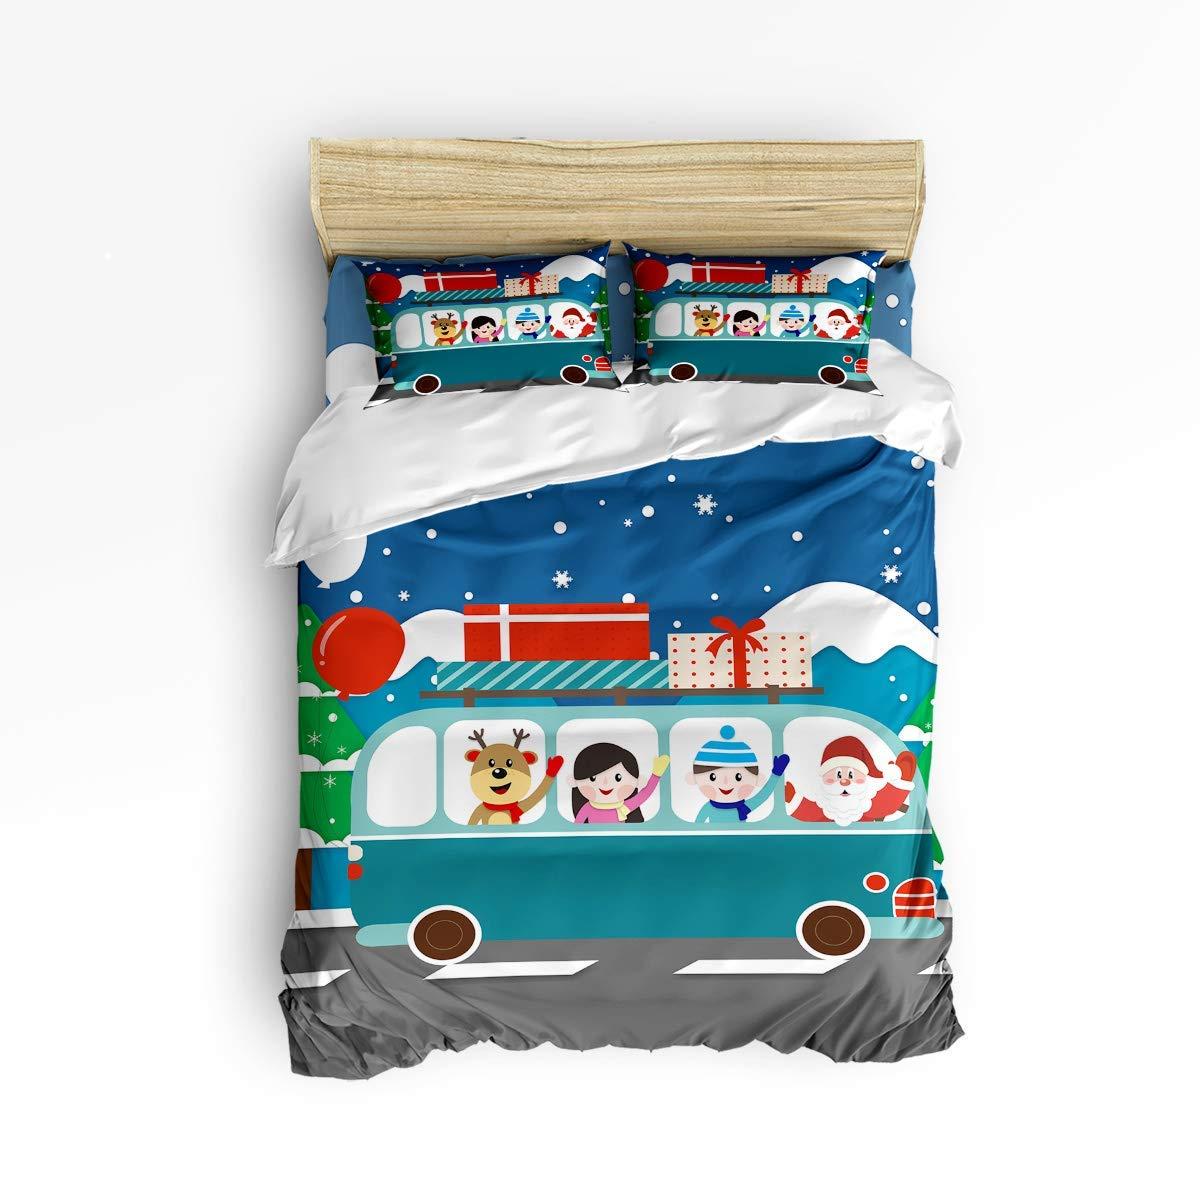 VAMIX サンタクロースがバスに送るギフト 寝具4点セット 掛け布団カバー クリスマスシーズン 高級ソフトフラットシーツセット 装飾枕シャム付き 10代の女の子 男の子 男性 女性 子供用 クイーン LFFMARNM11210EWLYX-SWTQ01499SJTCZLH B07QHXBSVV Christmas Gift Car クイーン